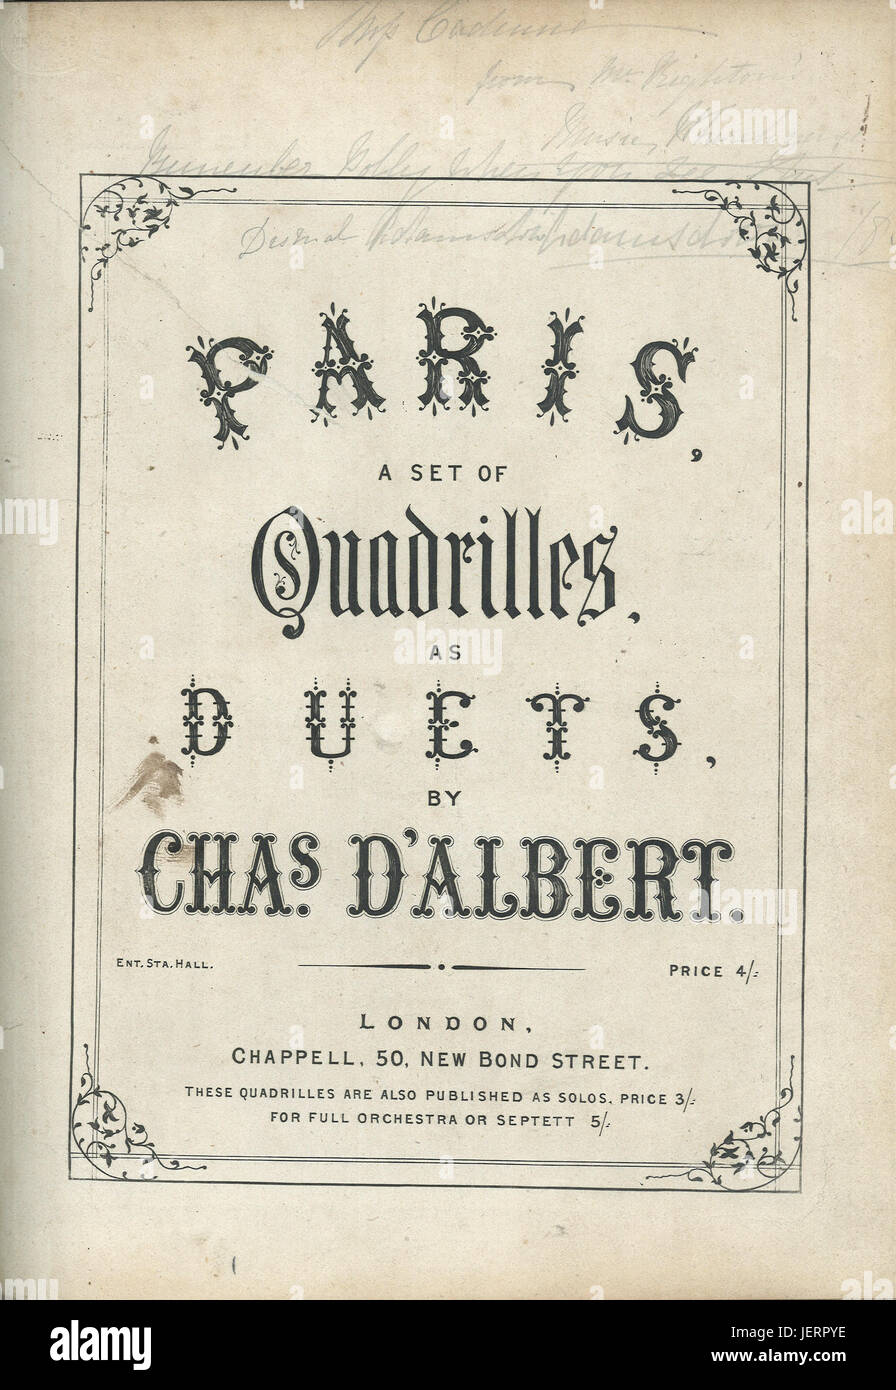 Paris -  a set of quadrilles as duets - 19 th century sheet music cover - Stock Image